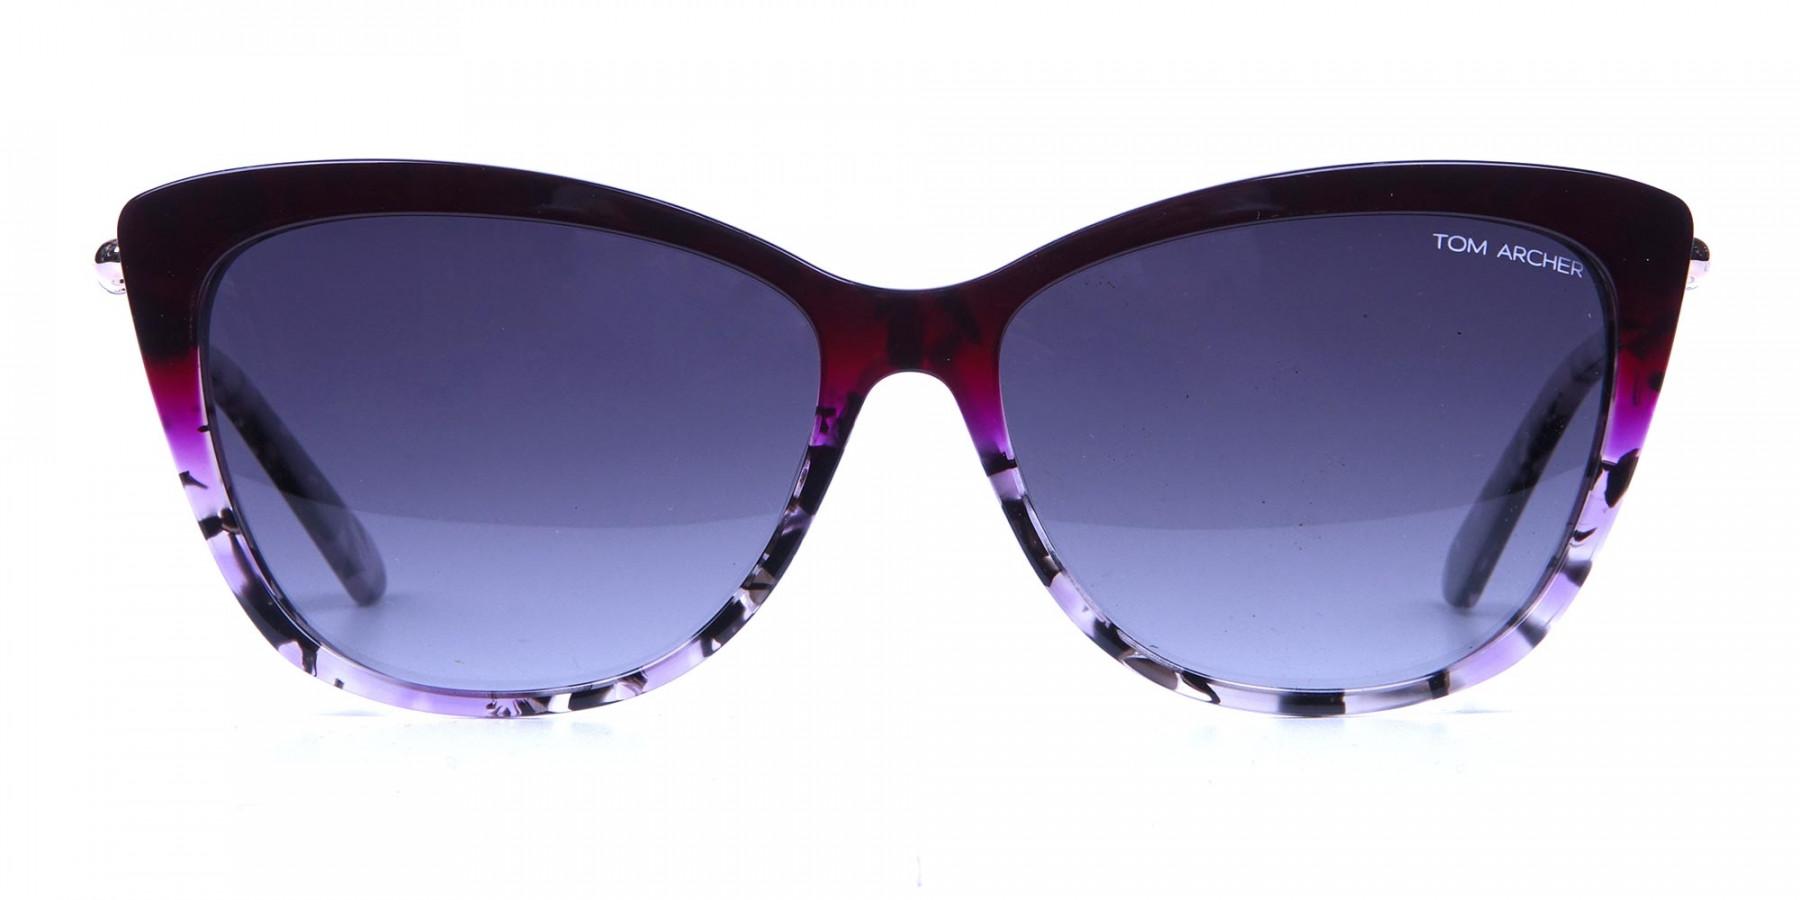 Drops of Wine Purple Cat Eye Sunglasses -2